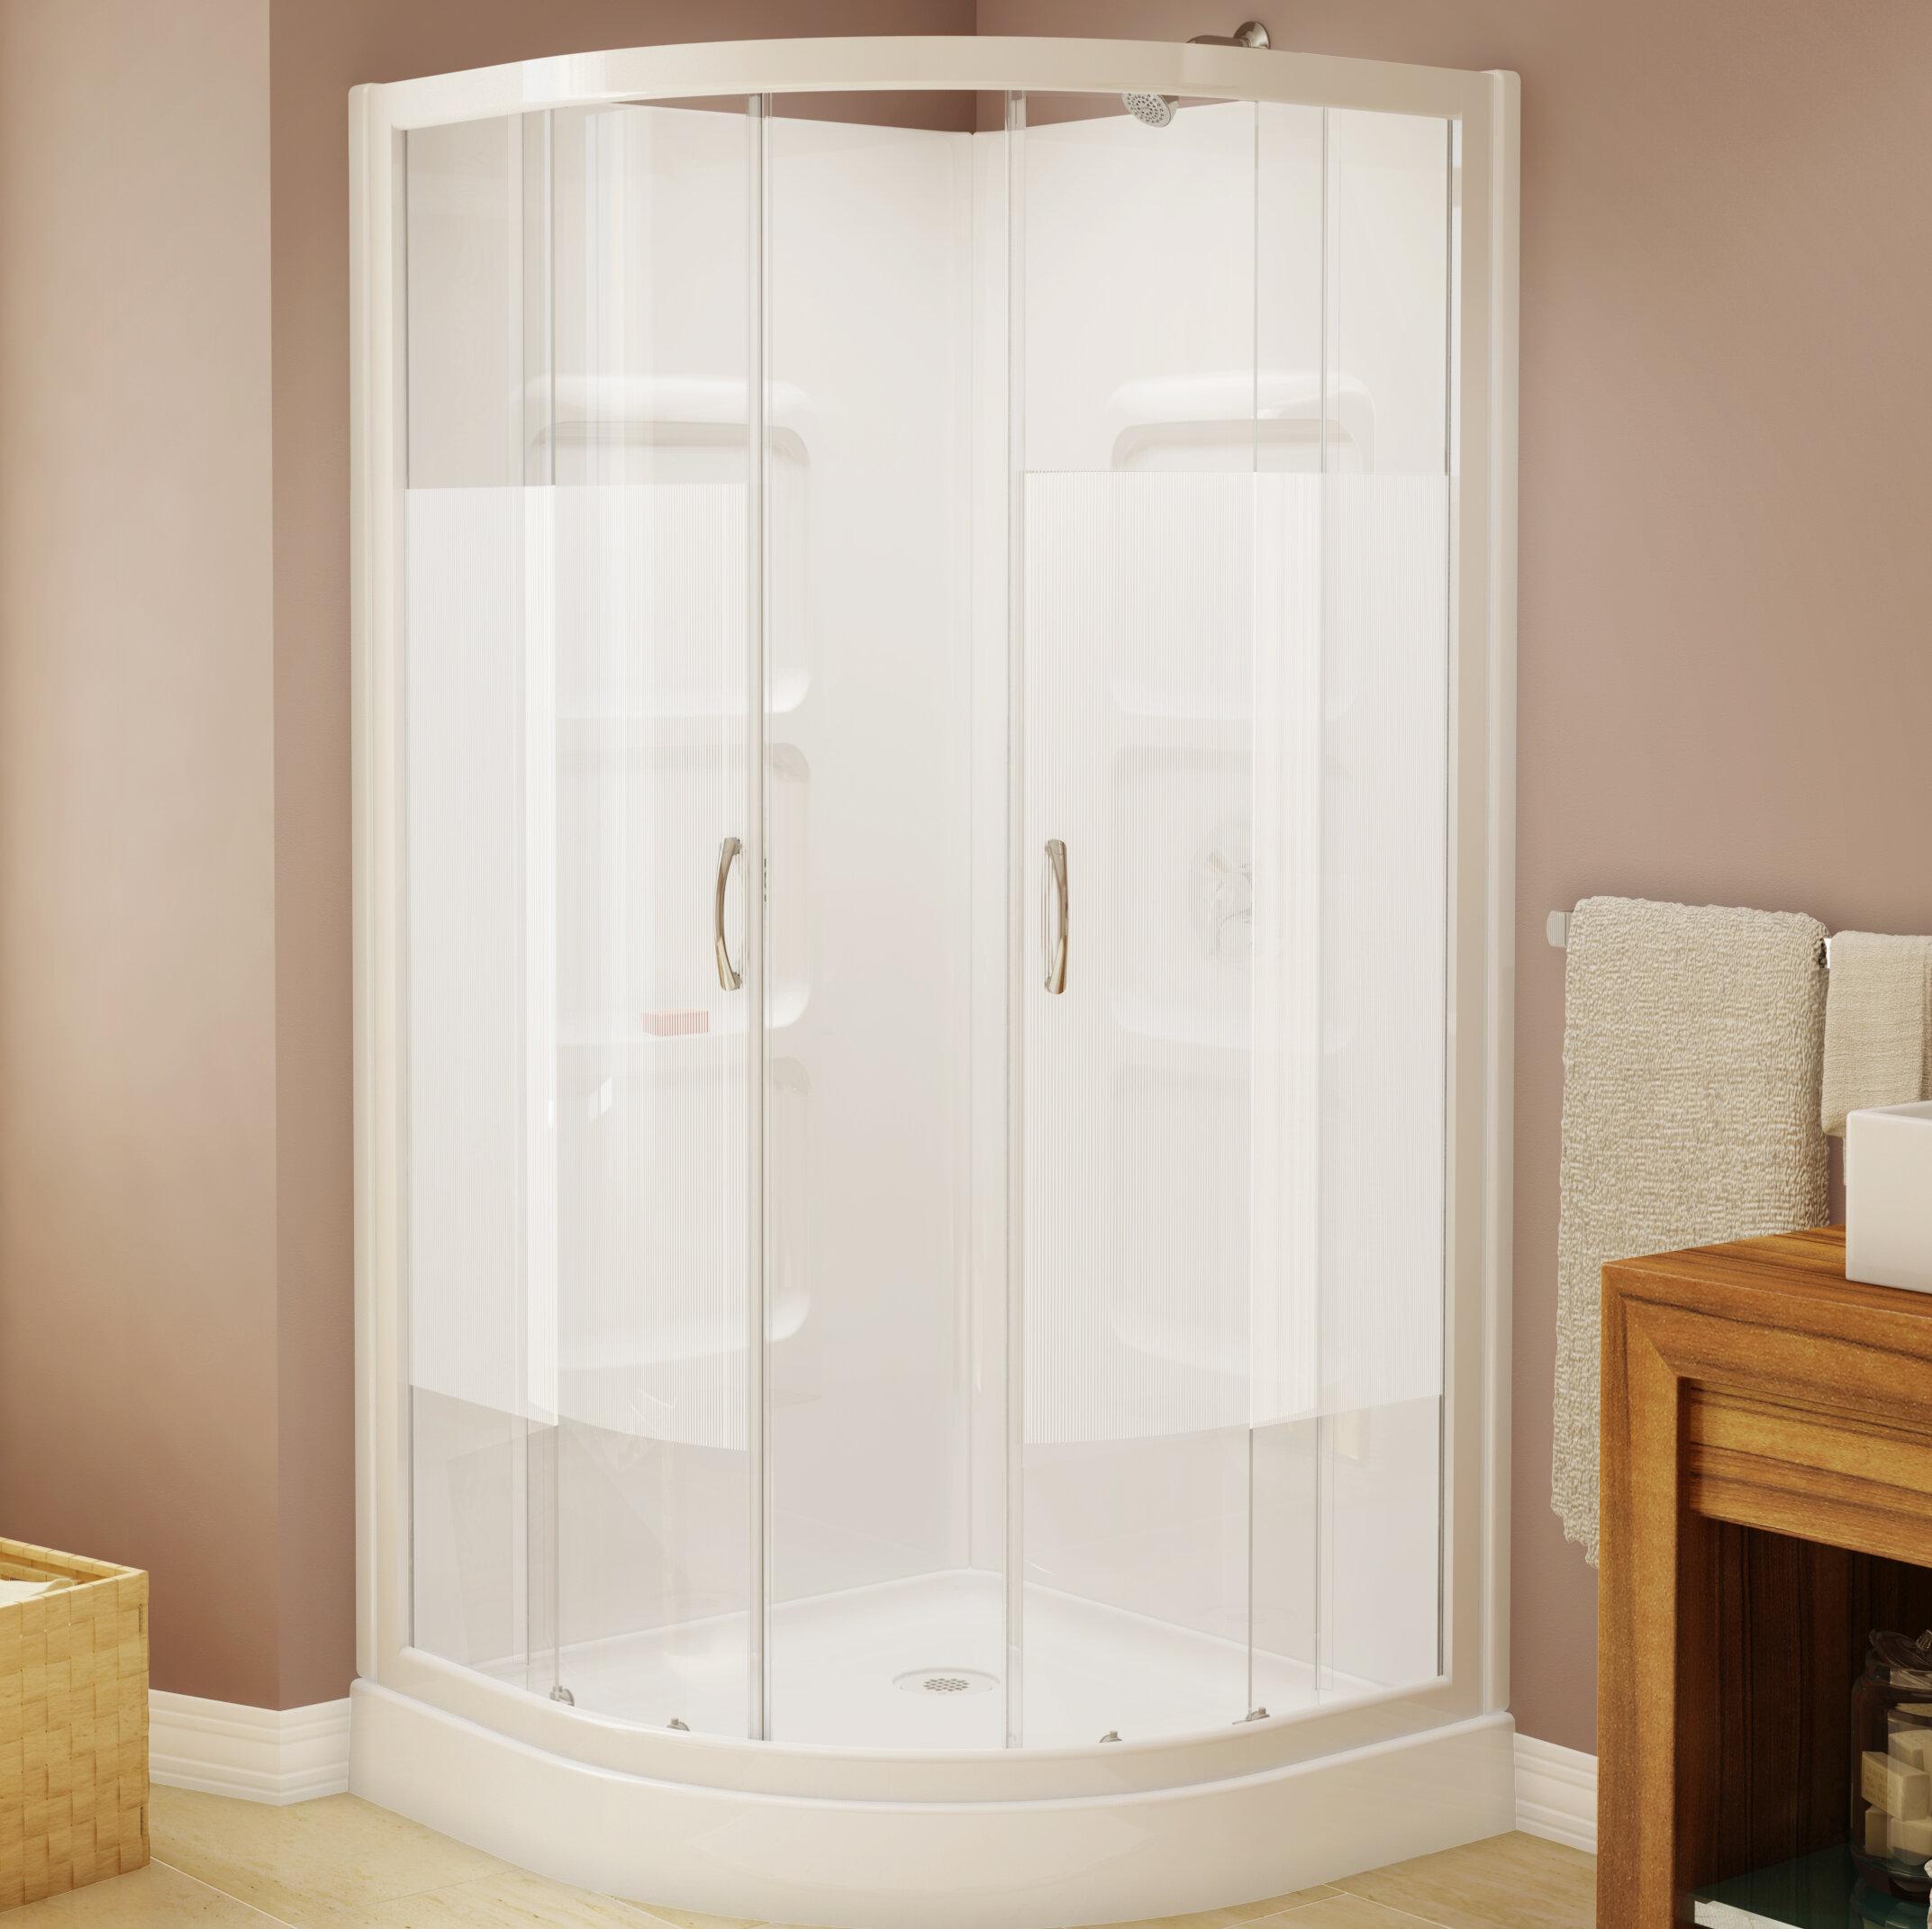 Ae Bath And Shower Mona 375 X 74 Neo Angle Sliding Shower